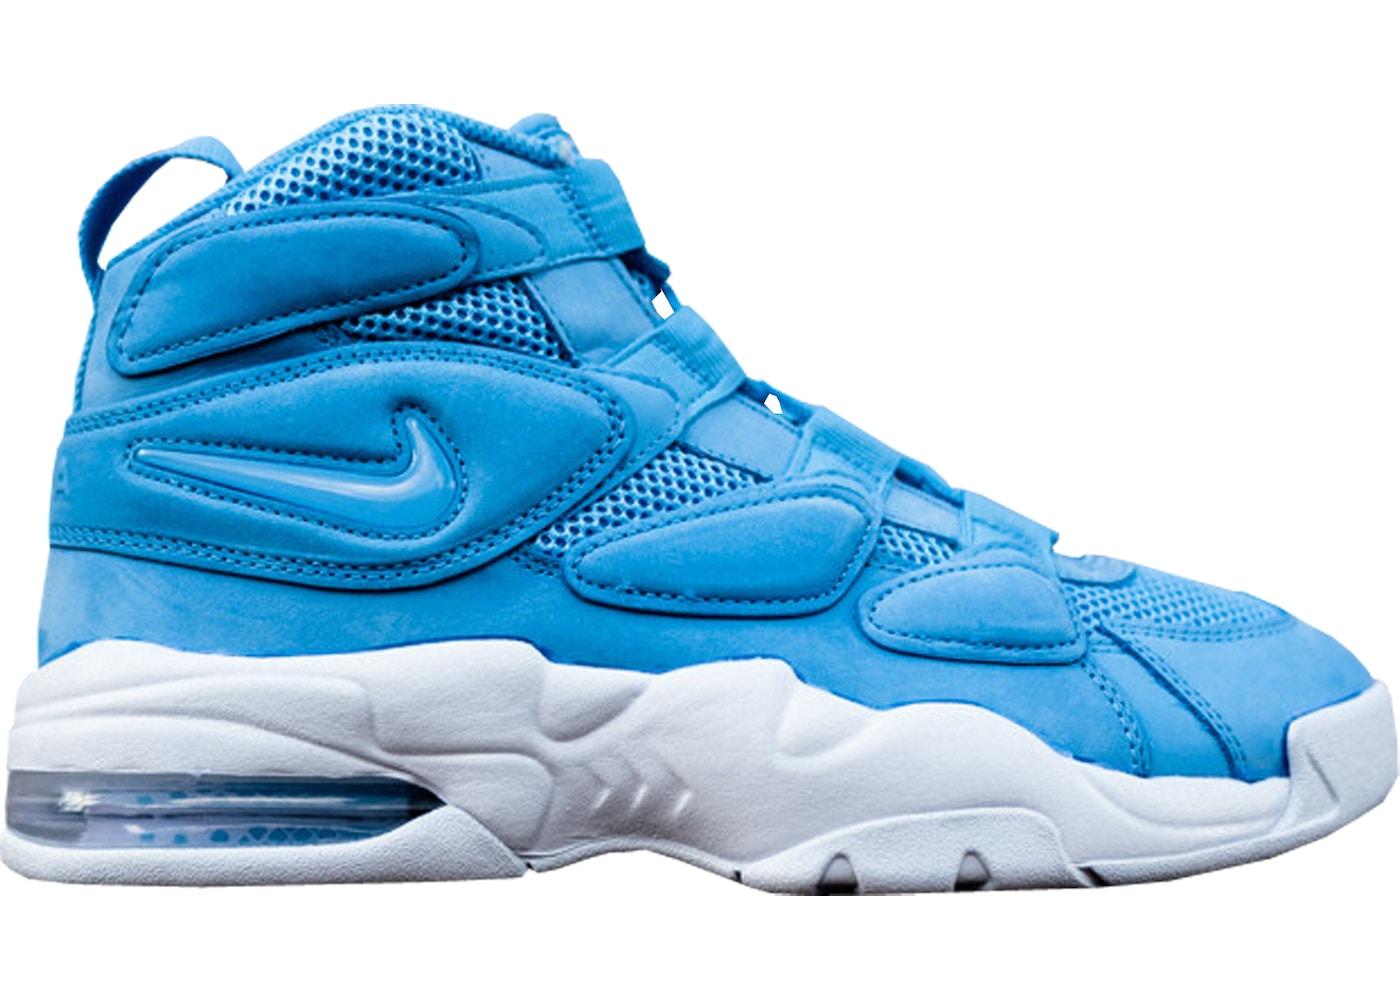 Nike Air Max 2 Uptempo 94 University Blue